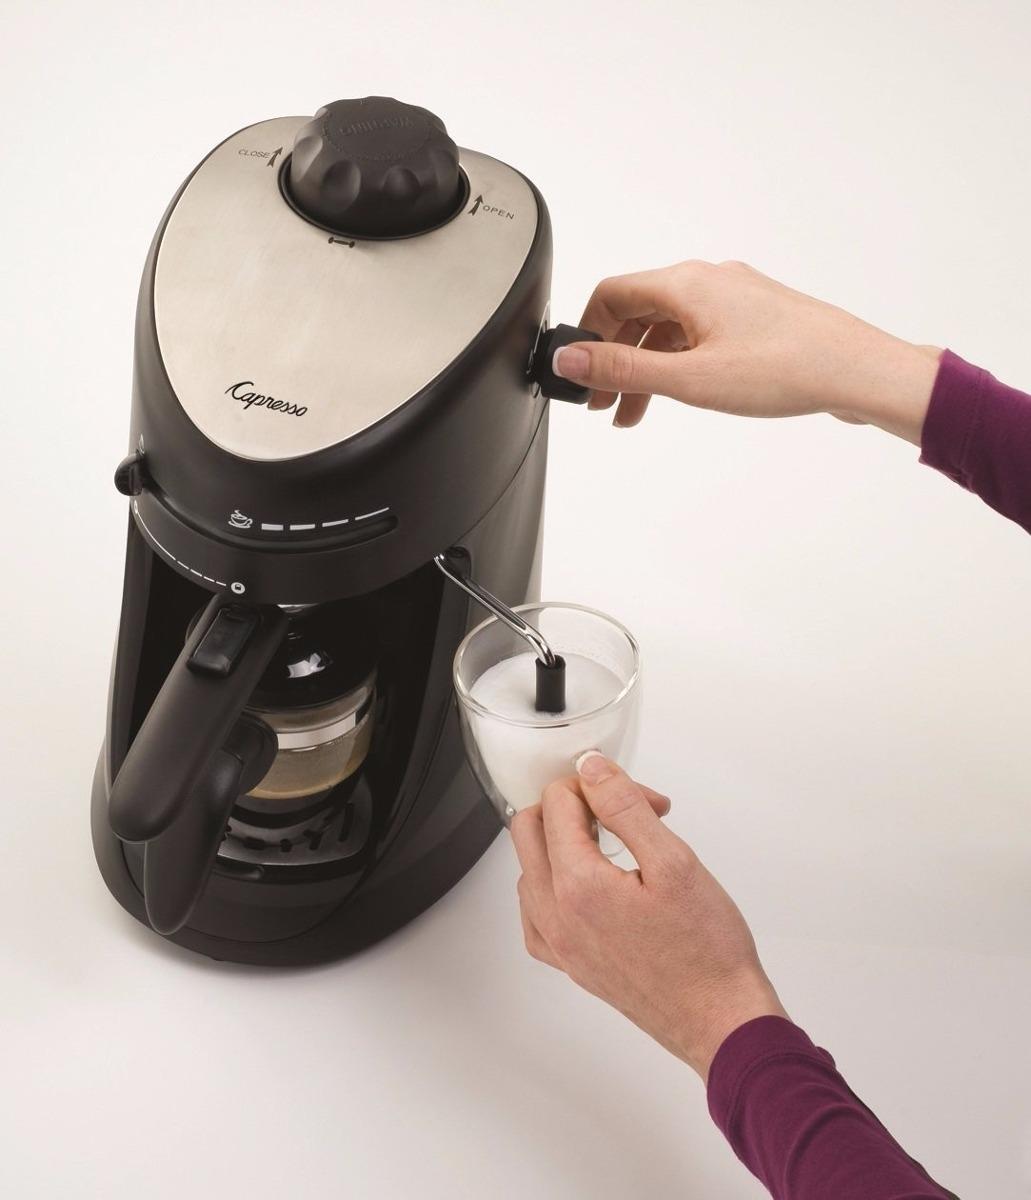 Capresso m quina para cappuccino y espresso para 4 tazas for Tazas para espresso